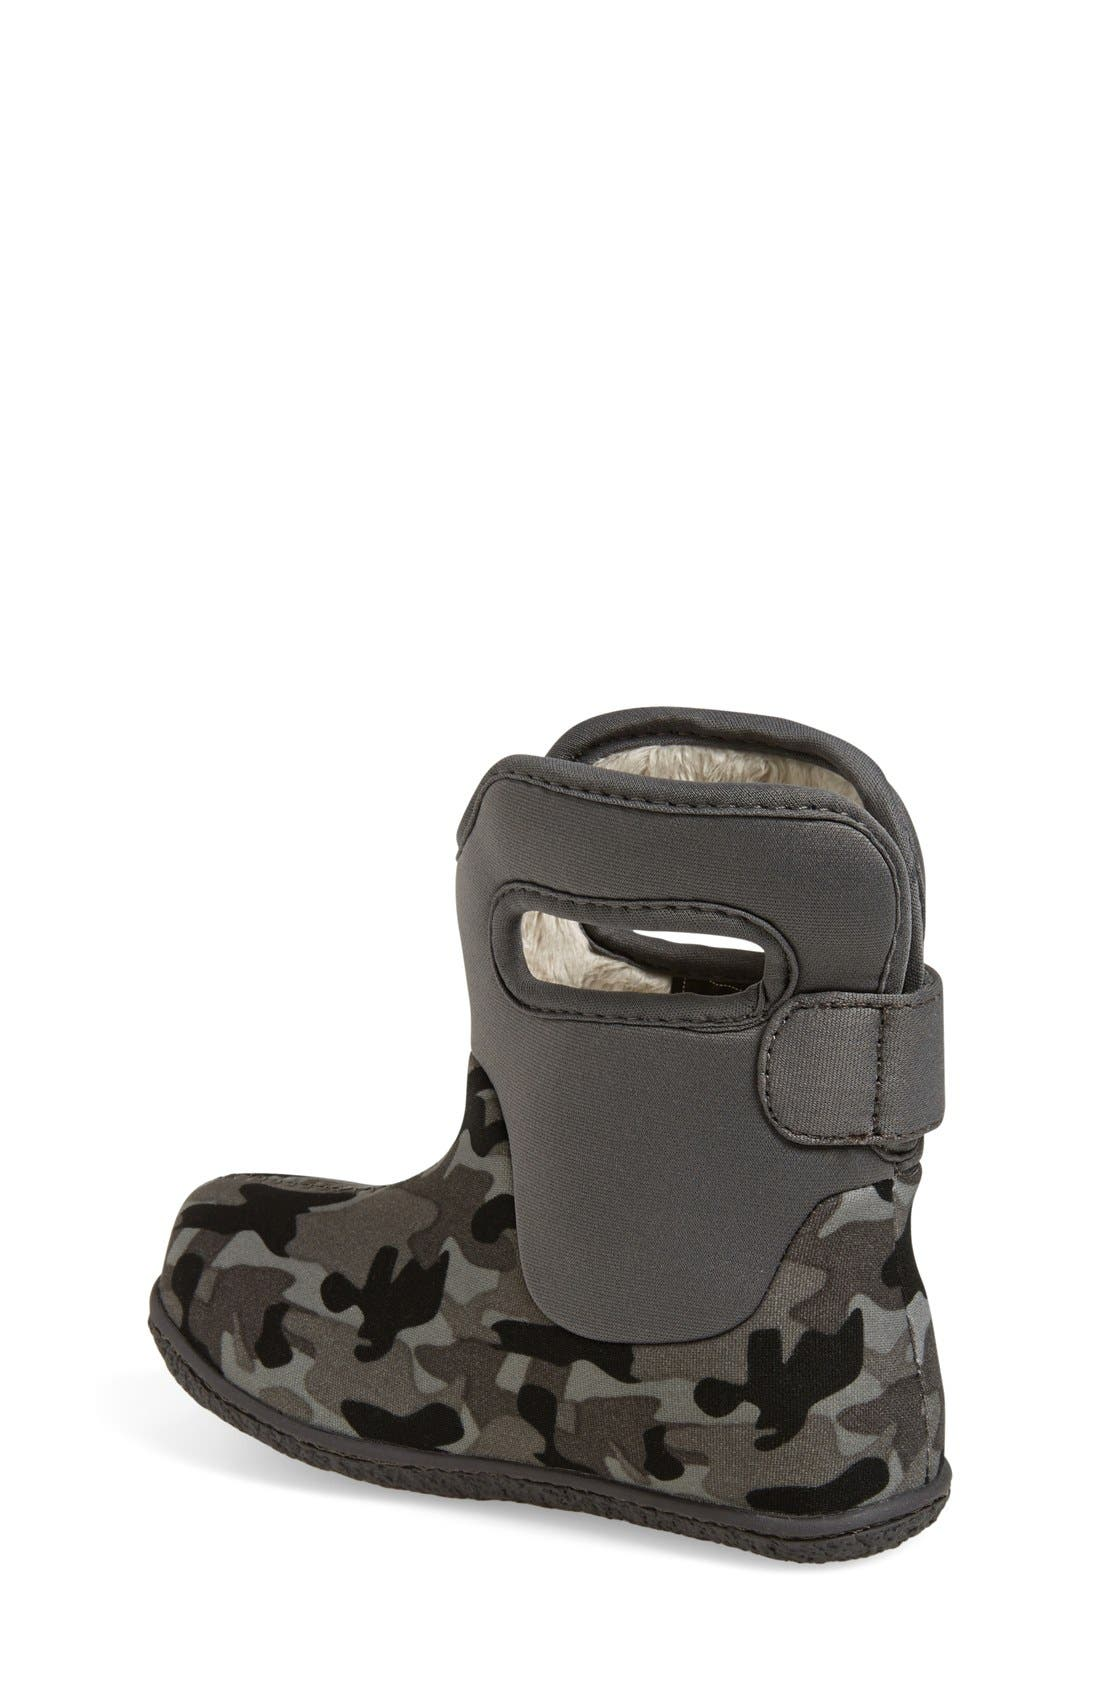 Alternate Image 2  - Bogs 'Baby Bogs - Camo' Waterproof Boot (Walker & Toddler)